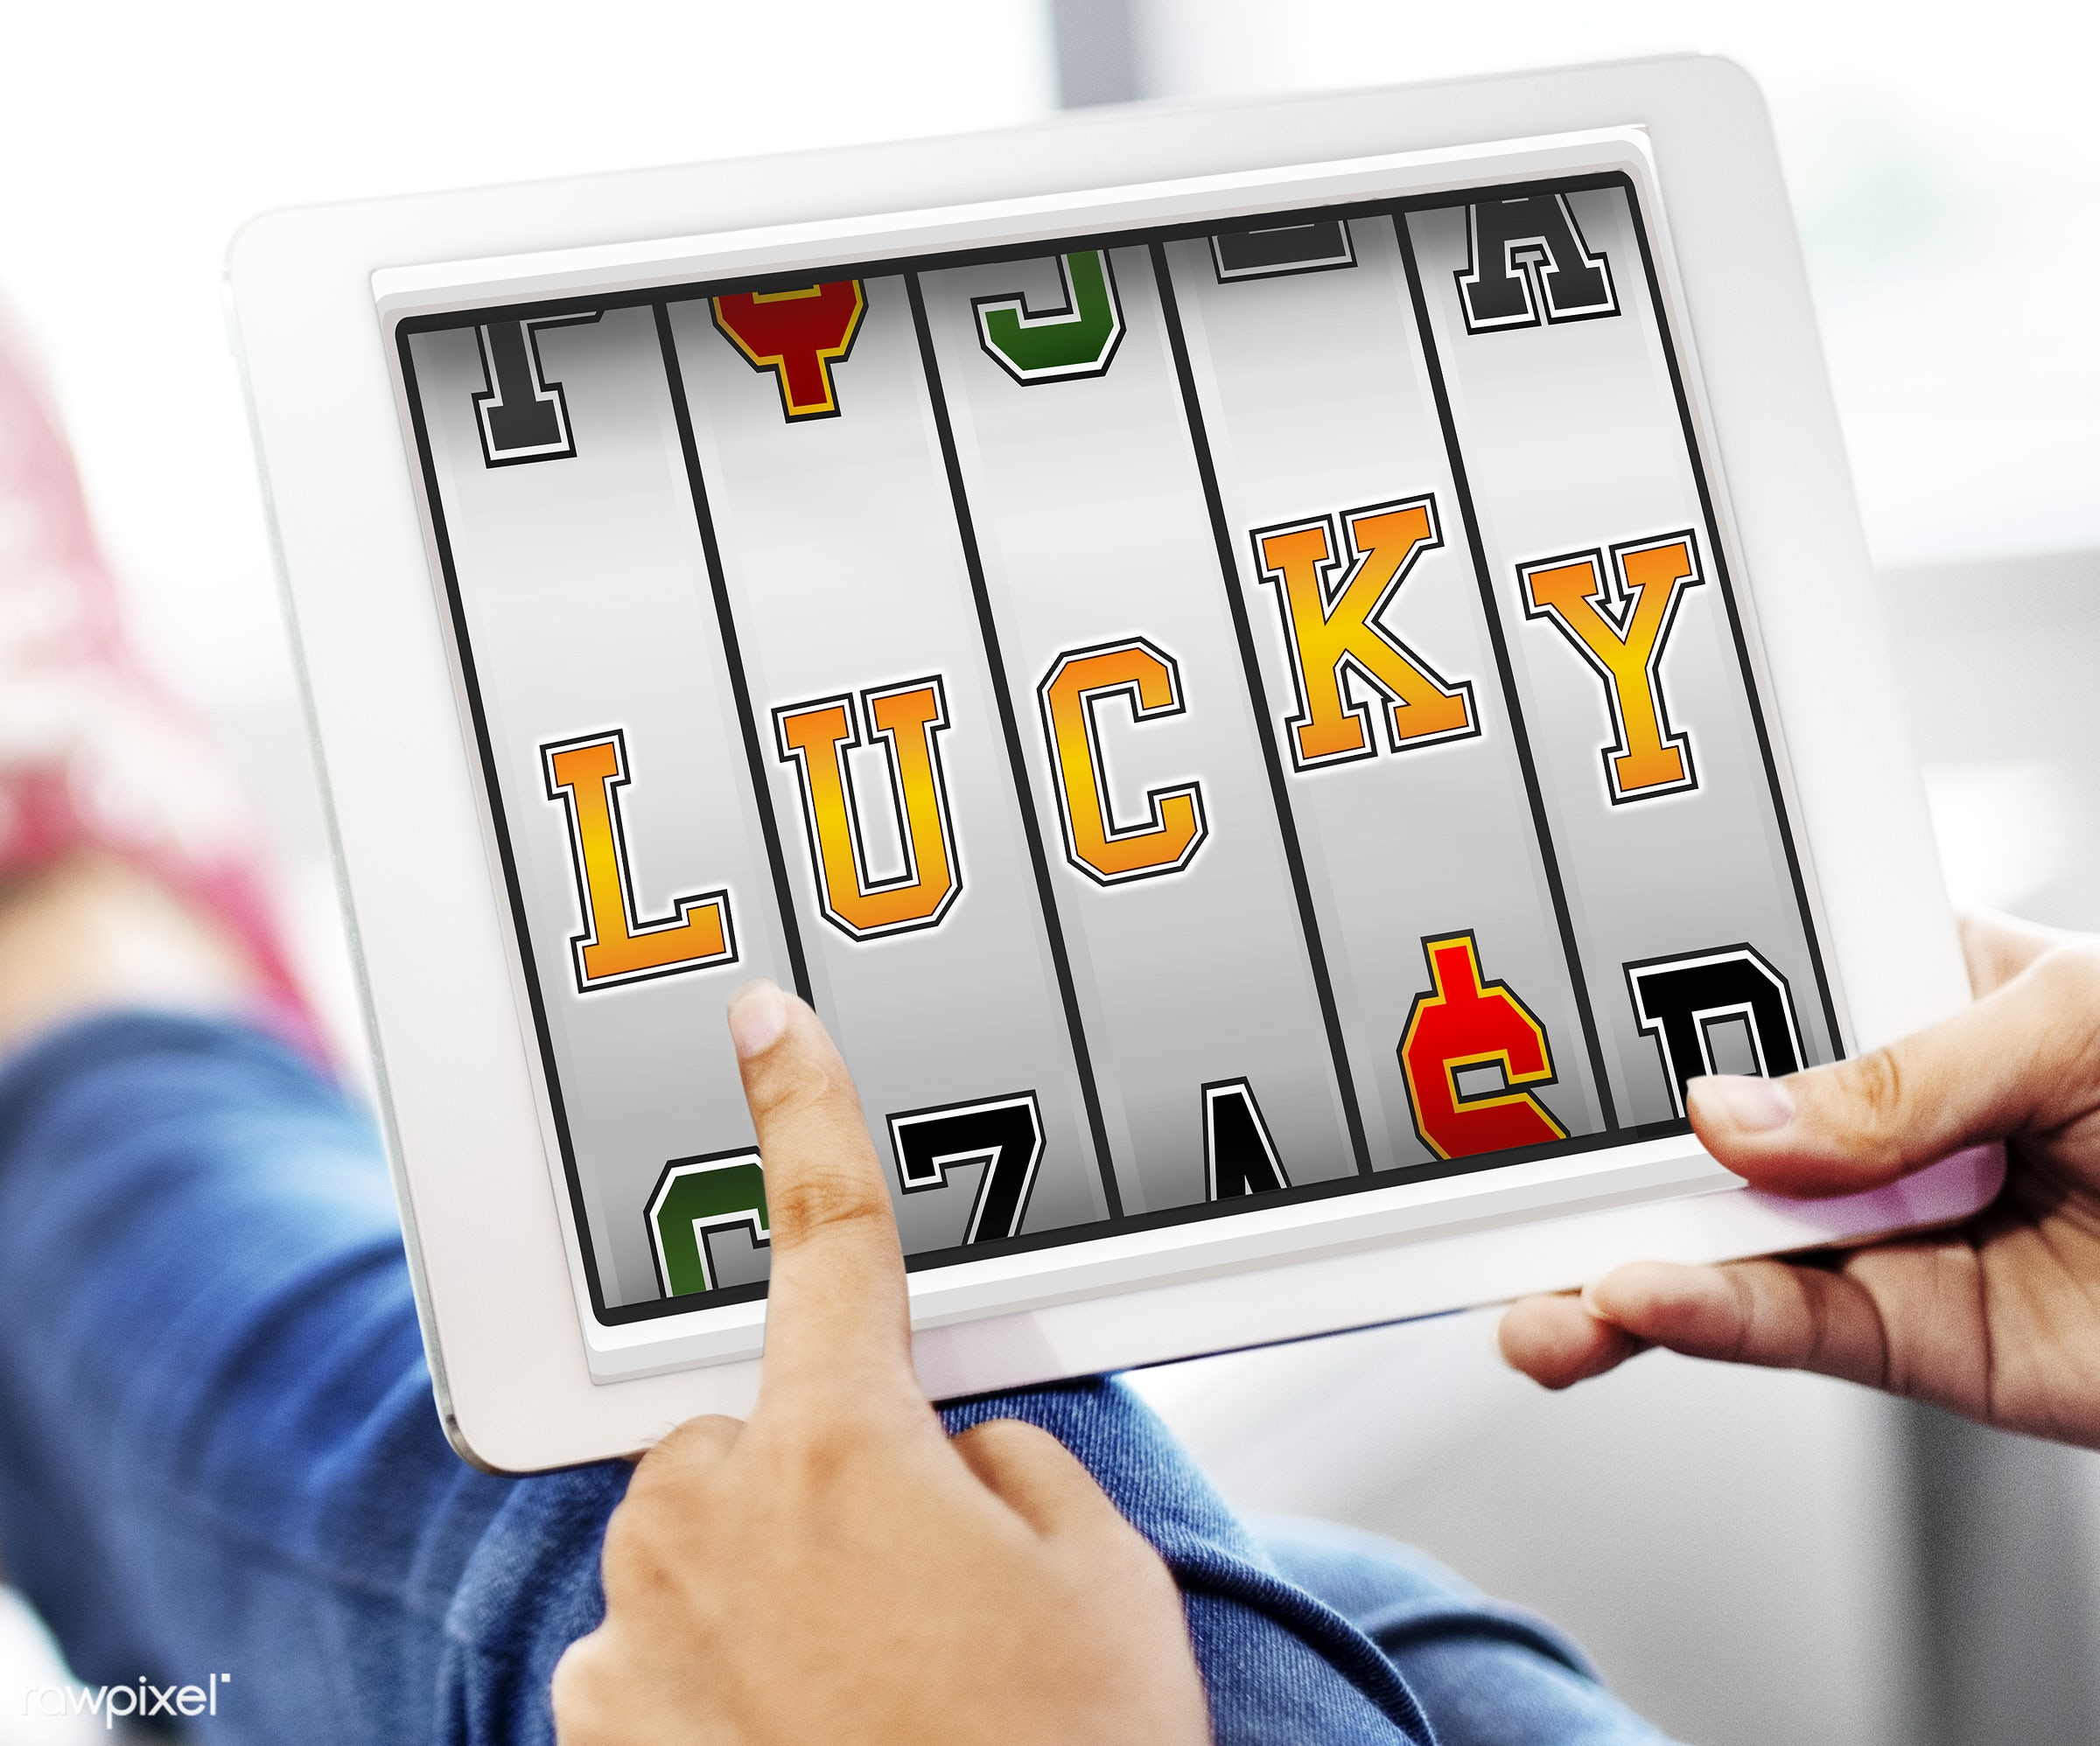 audio, bet, bingo, browsing, casual, celebrate, celebration, chance, design, digital tablet, gamble, game, graphics, hands,...